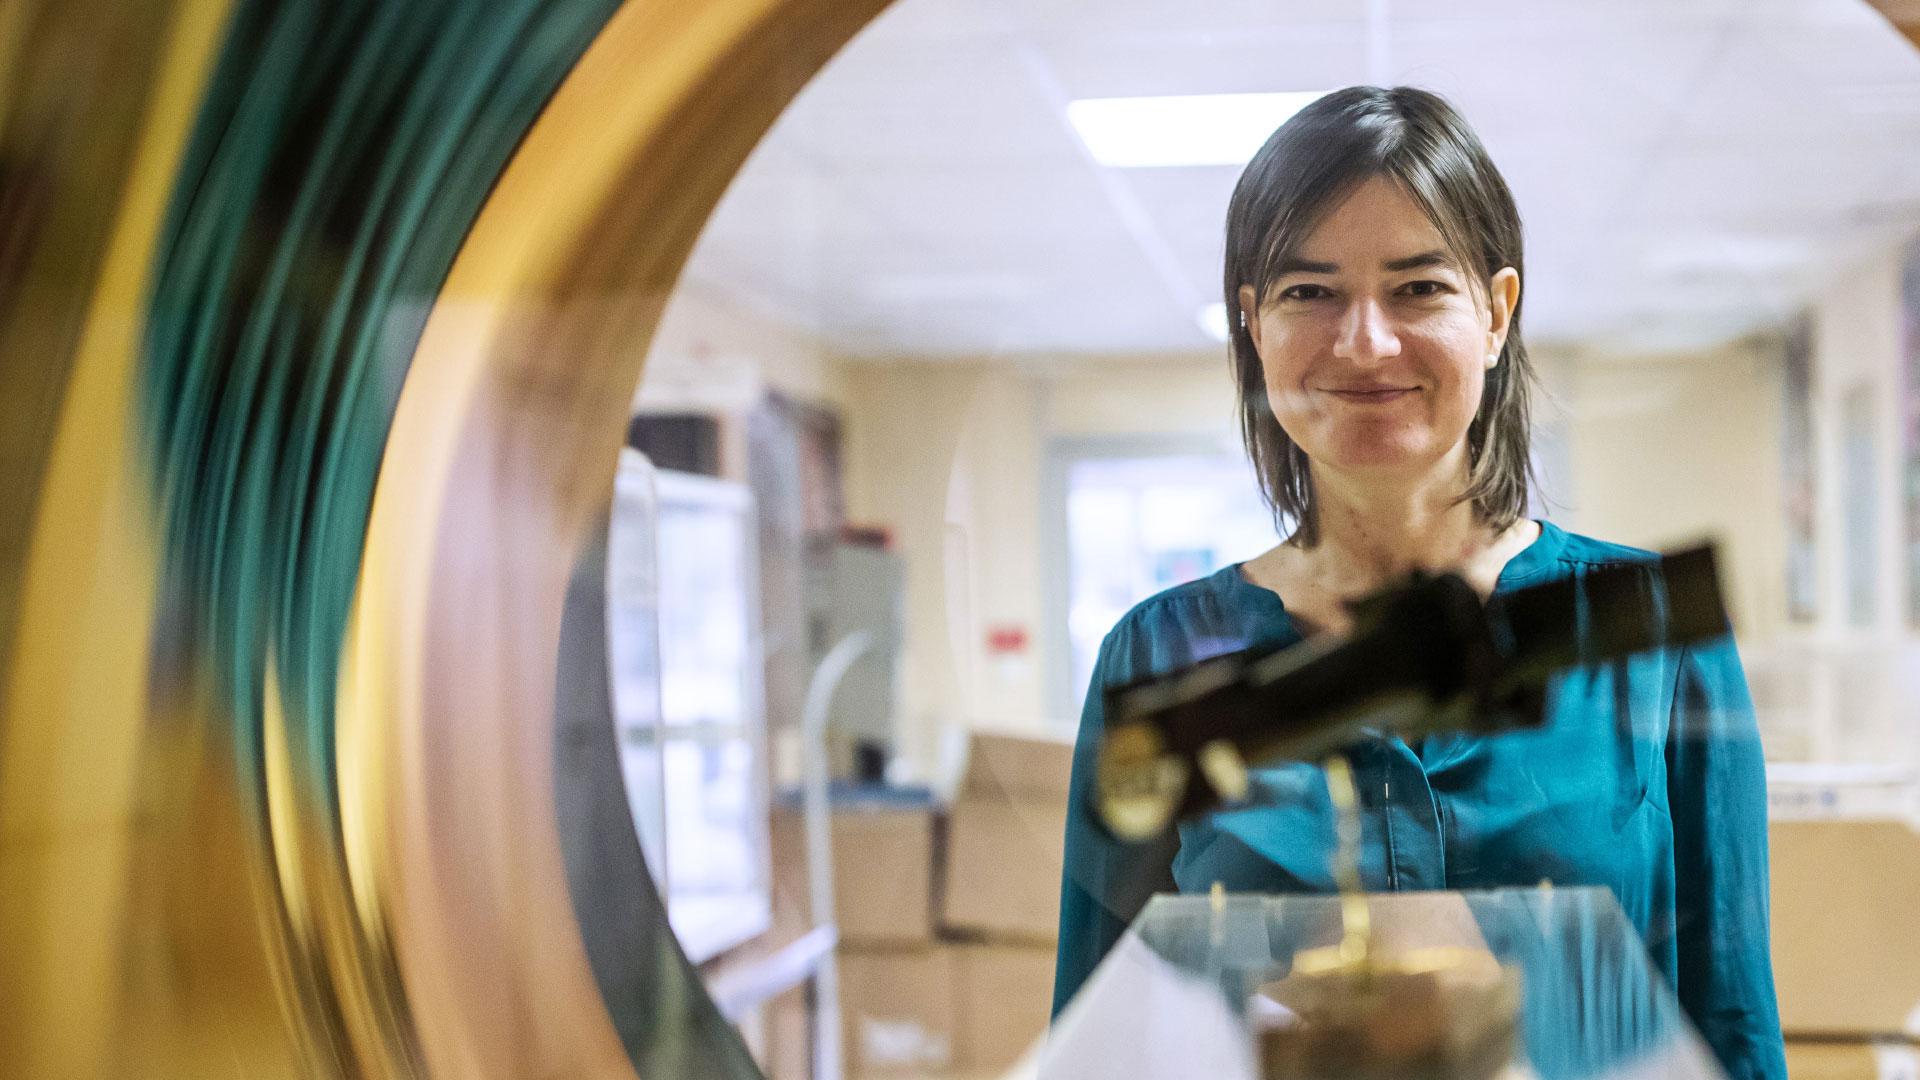 Valeria Pettorino on Learning About Dark Energy With the Euclid Satellite | Quanta Magazine